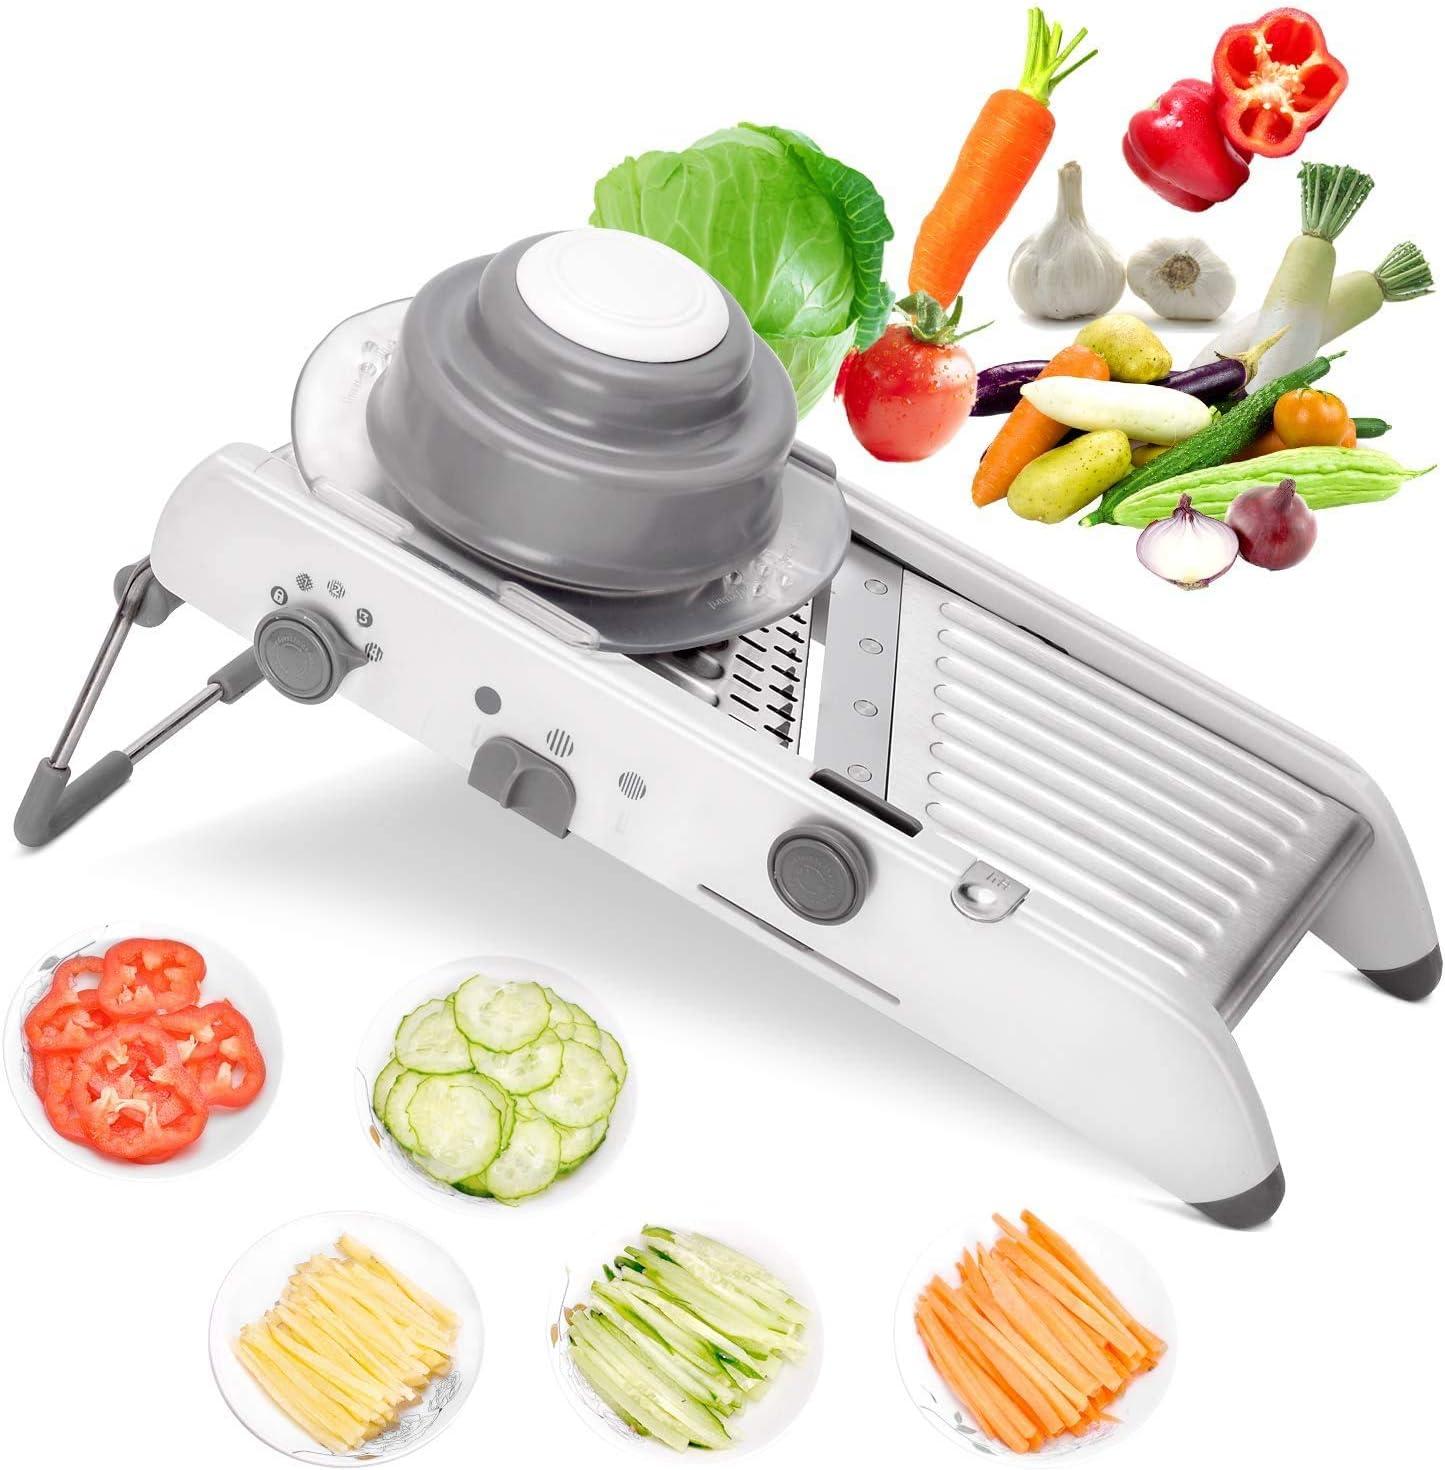 Manual Vegetable Slicer Potato Fruit Cutter Stainless Steel Mandoline Kitchen US